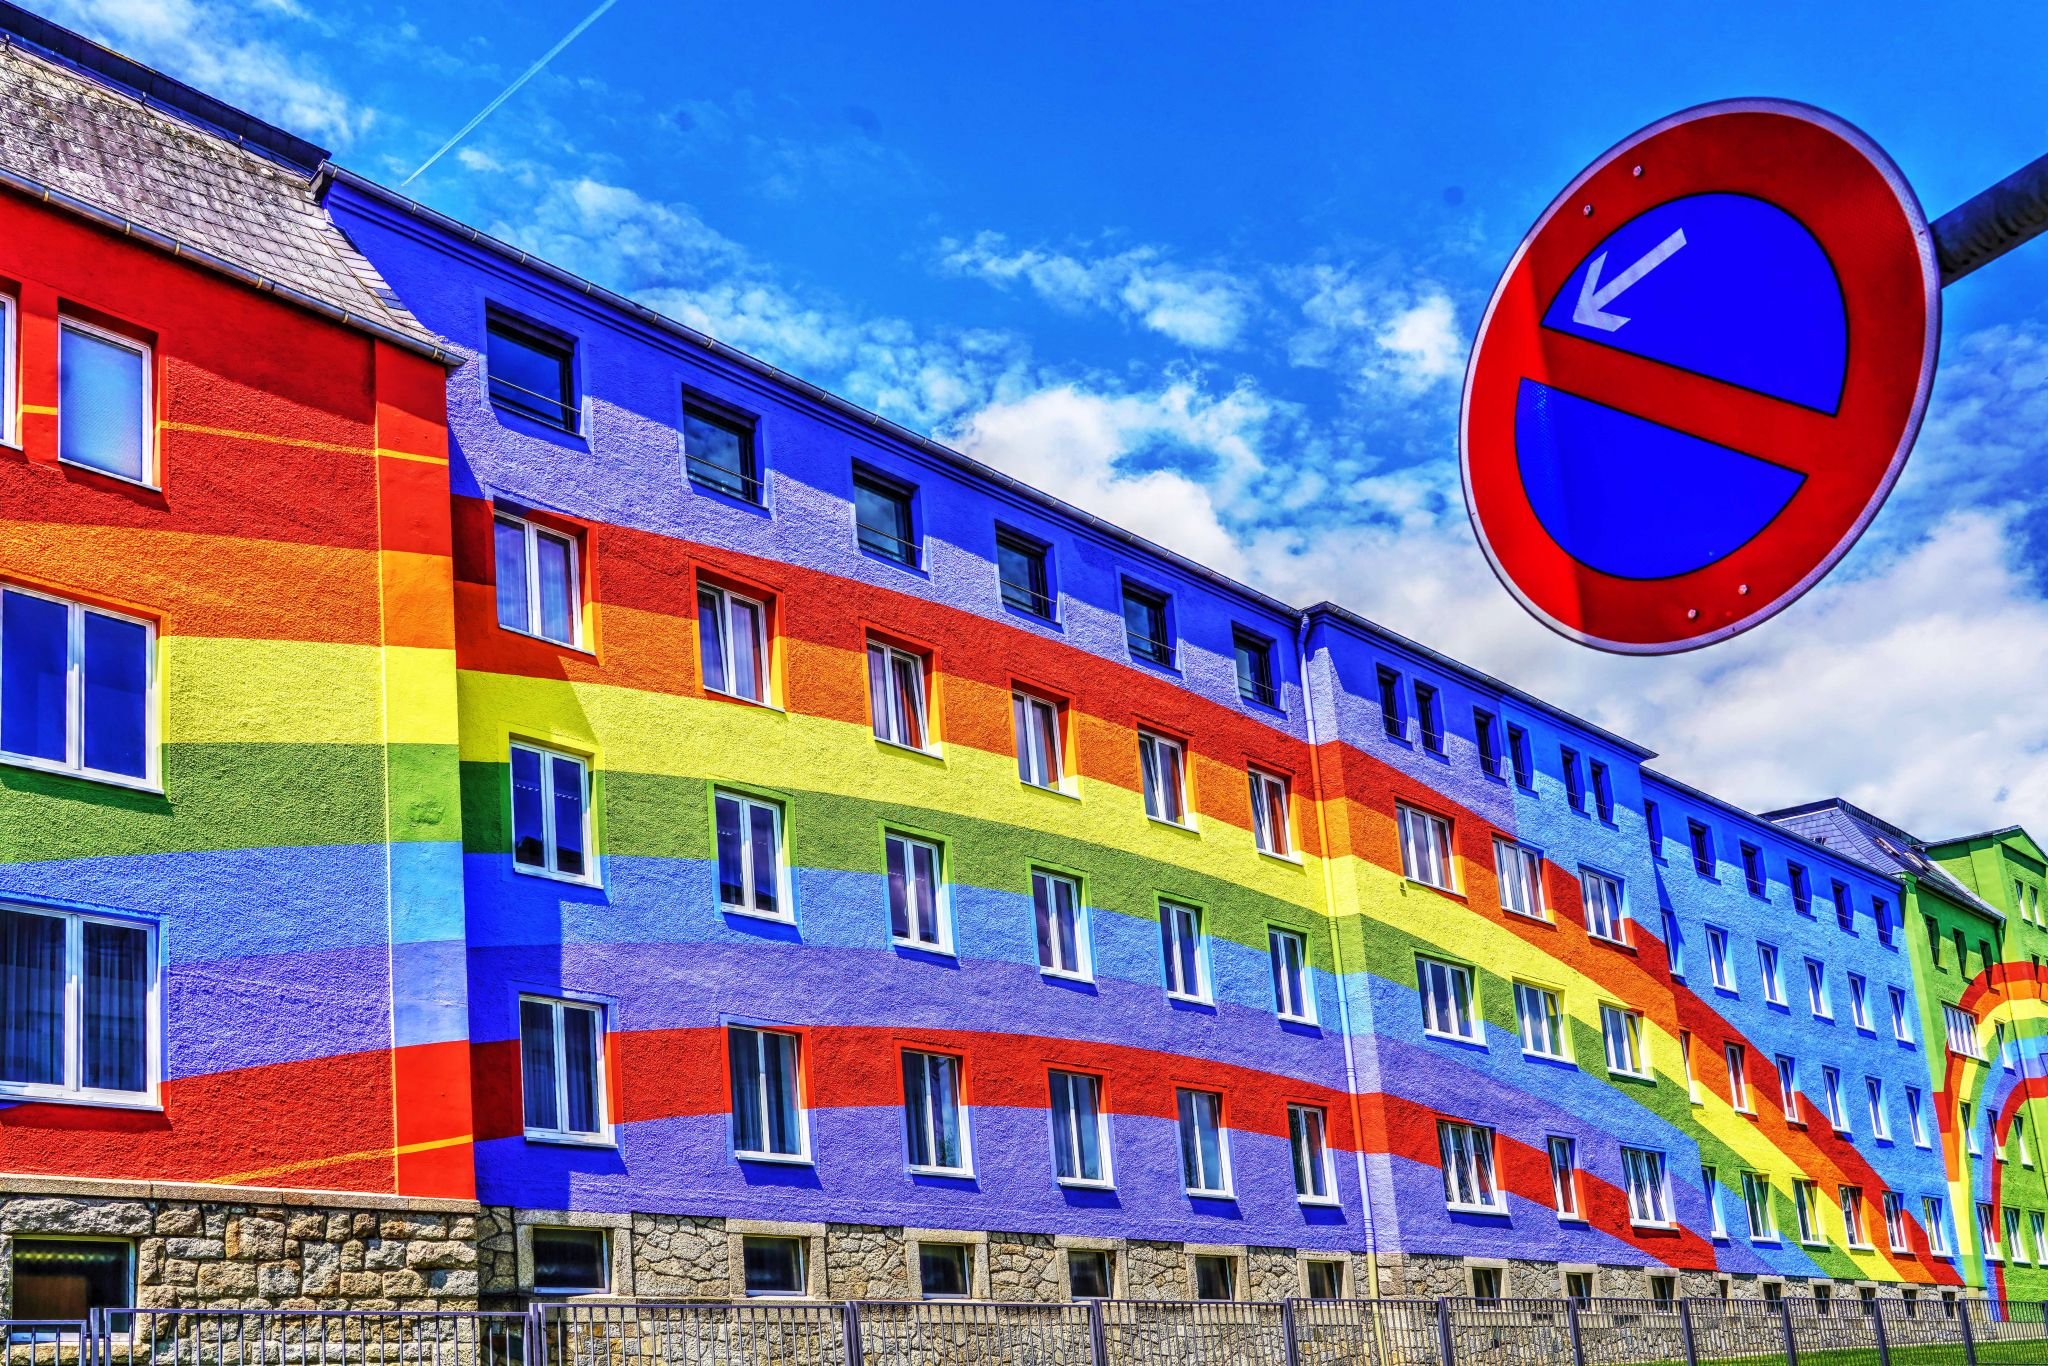 Rainbow House in Selb (Bavaria, Germany), Germany